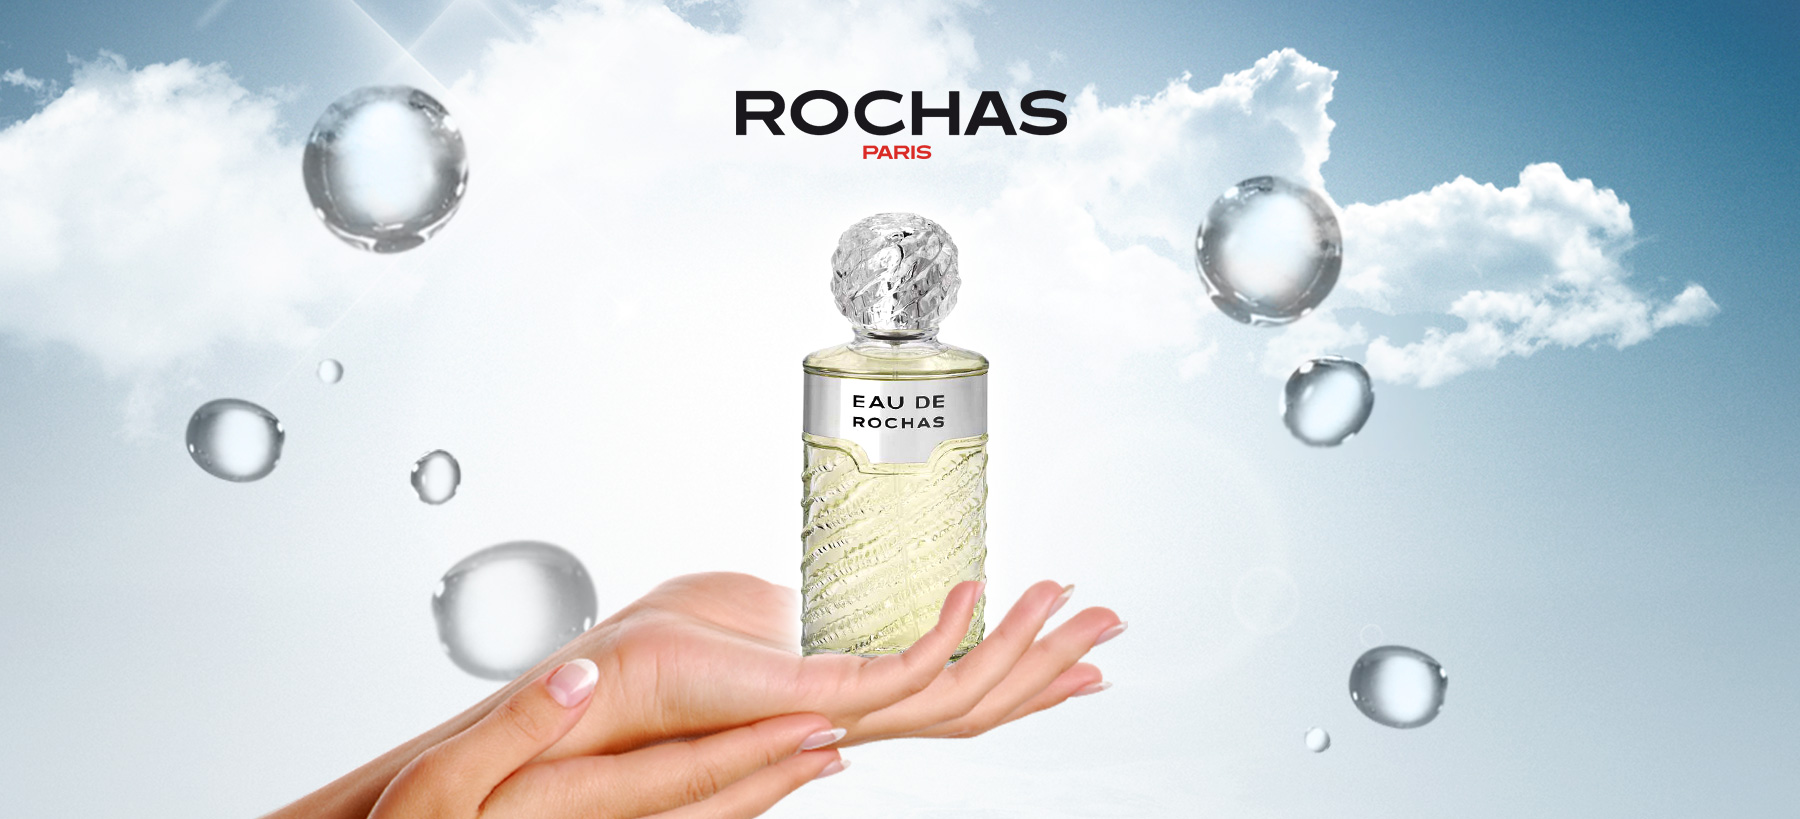 Directeur artistique freelance Portfolio Paris - Rochas